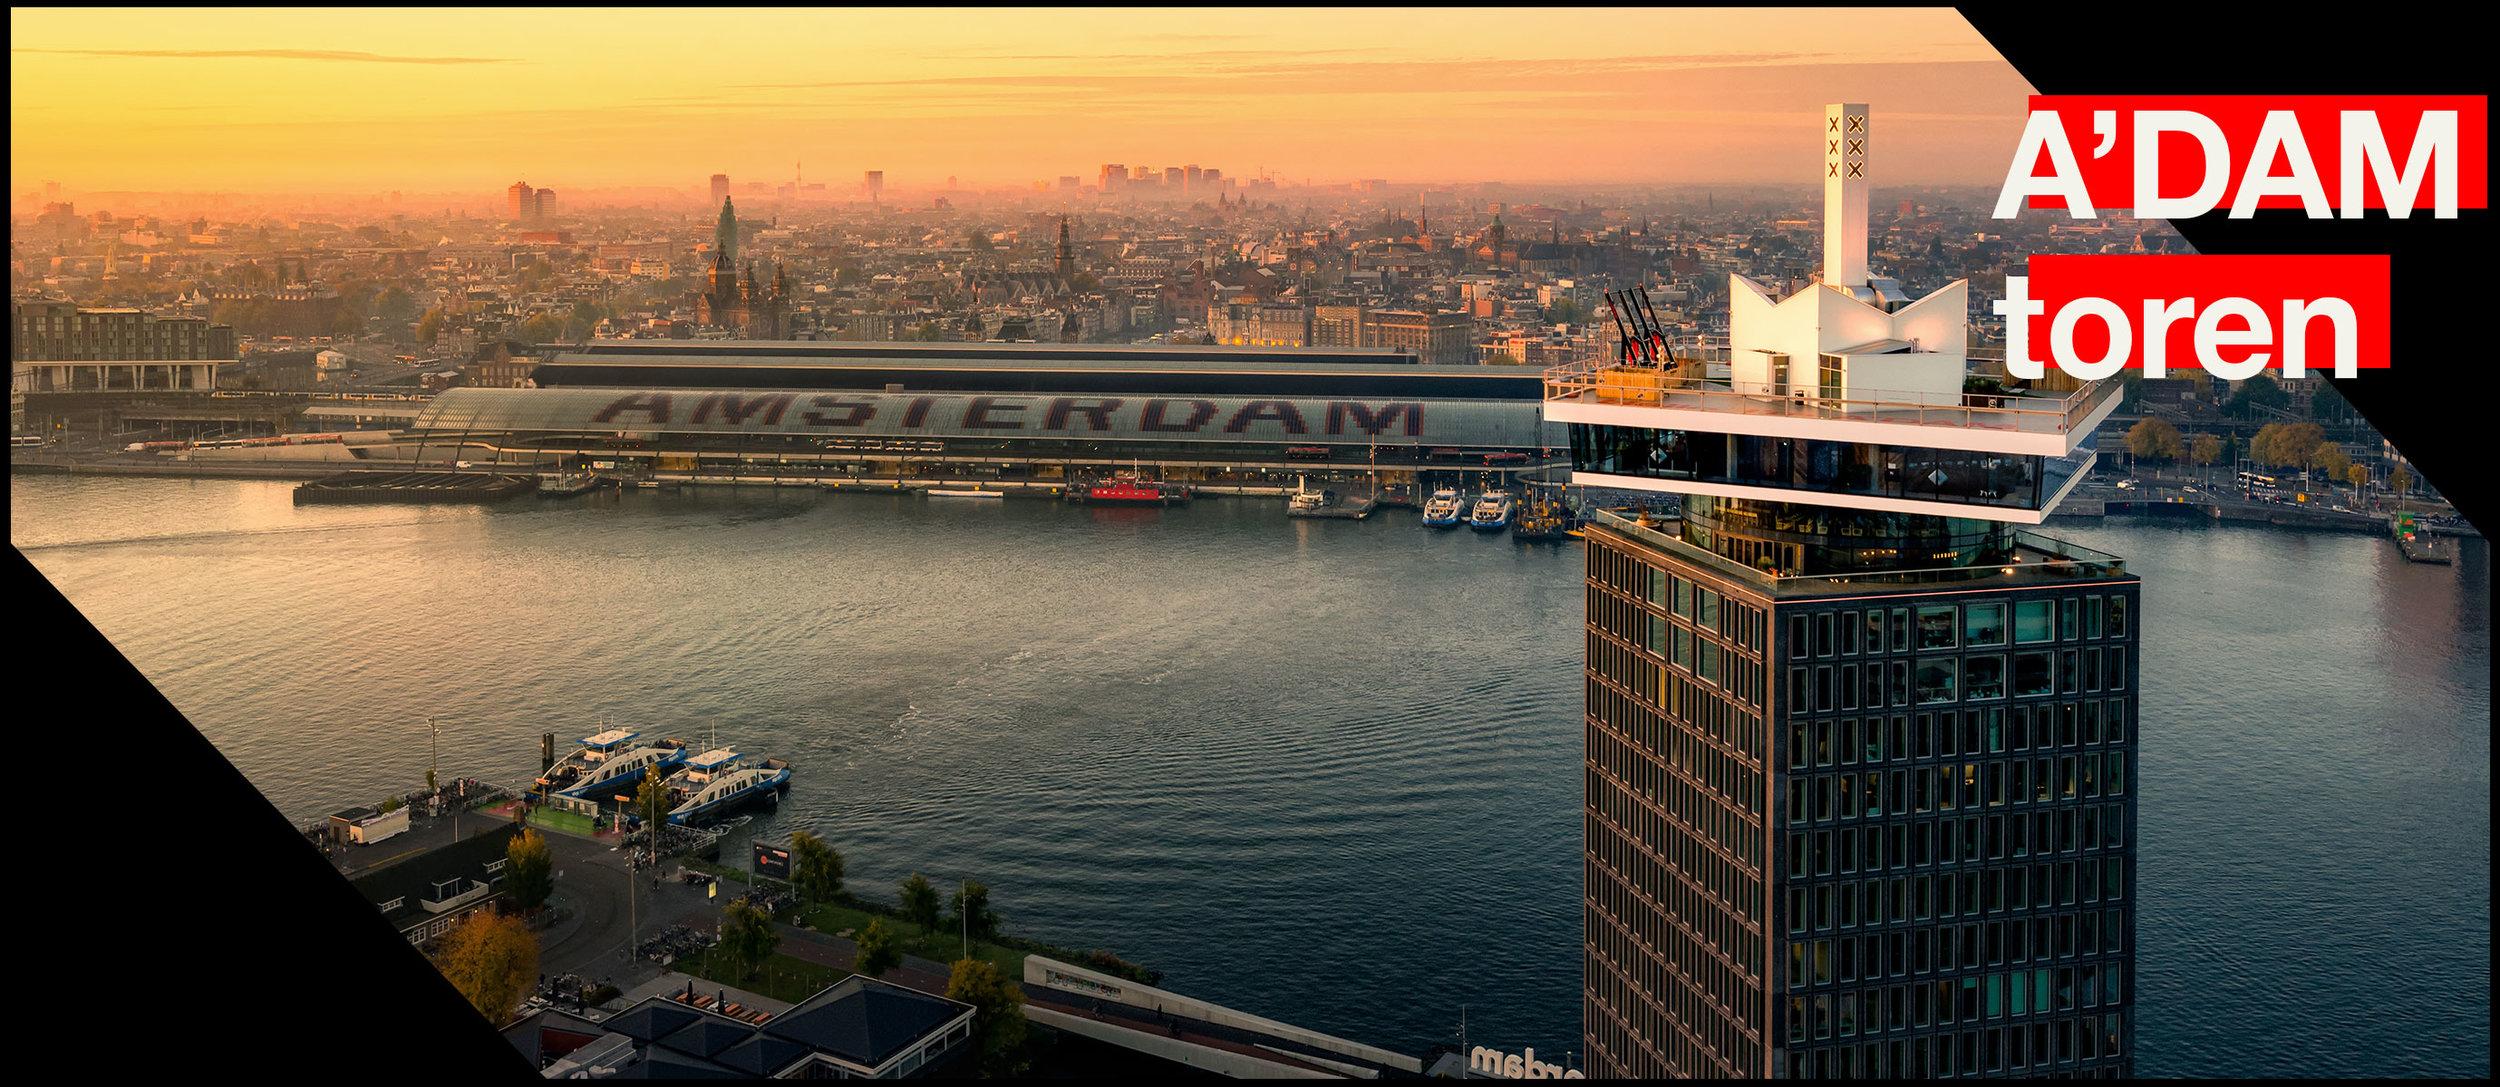 adamandco-work-amsterdam-adam-toren.jpg